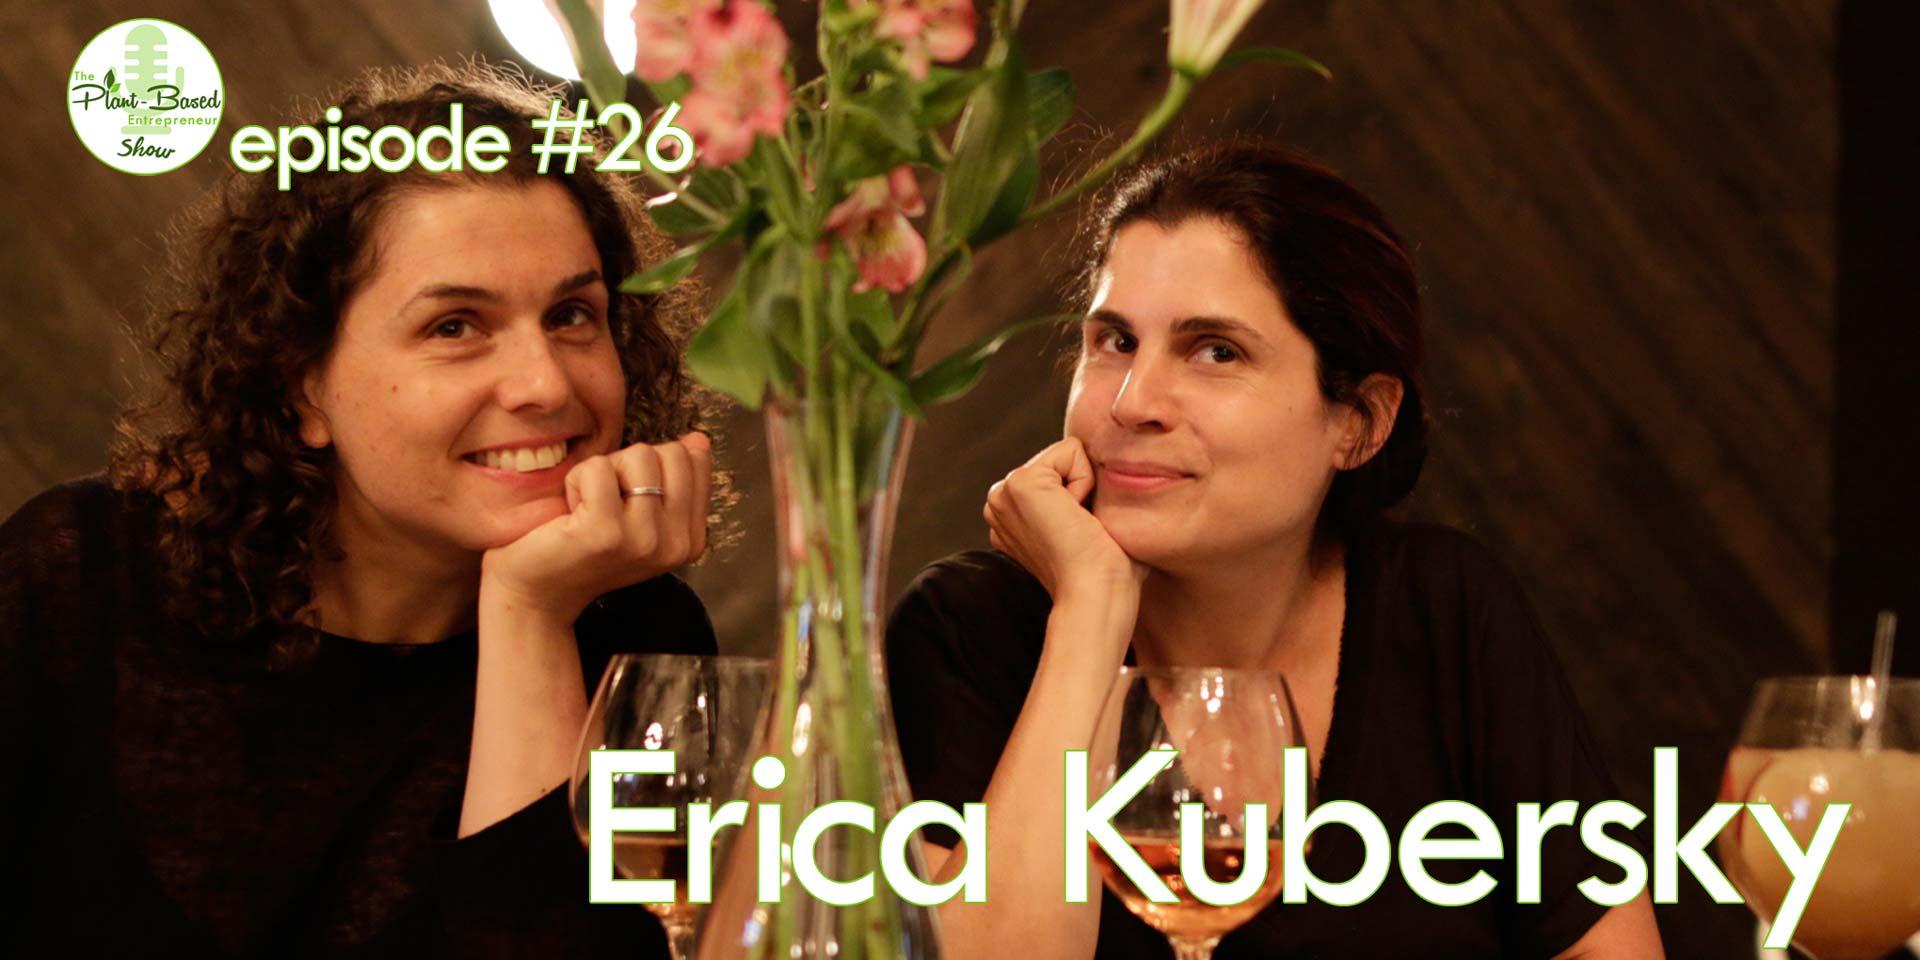 Episode #26 - Erica Kubersky